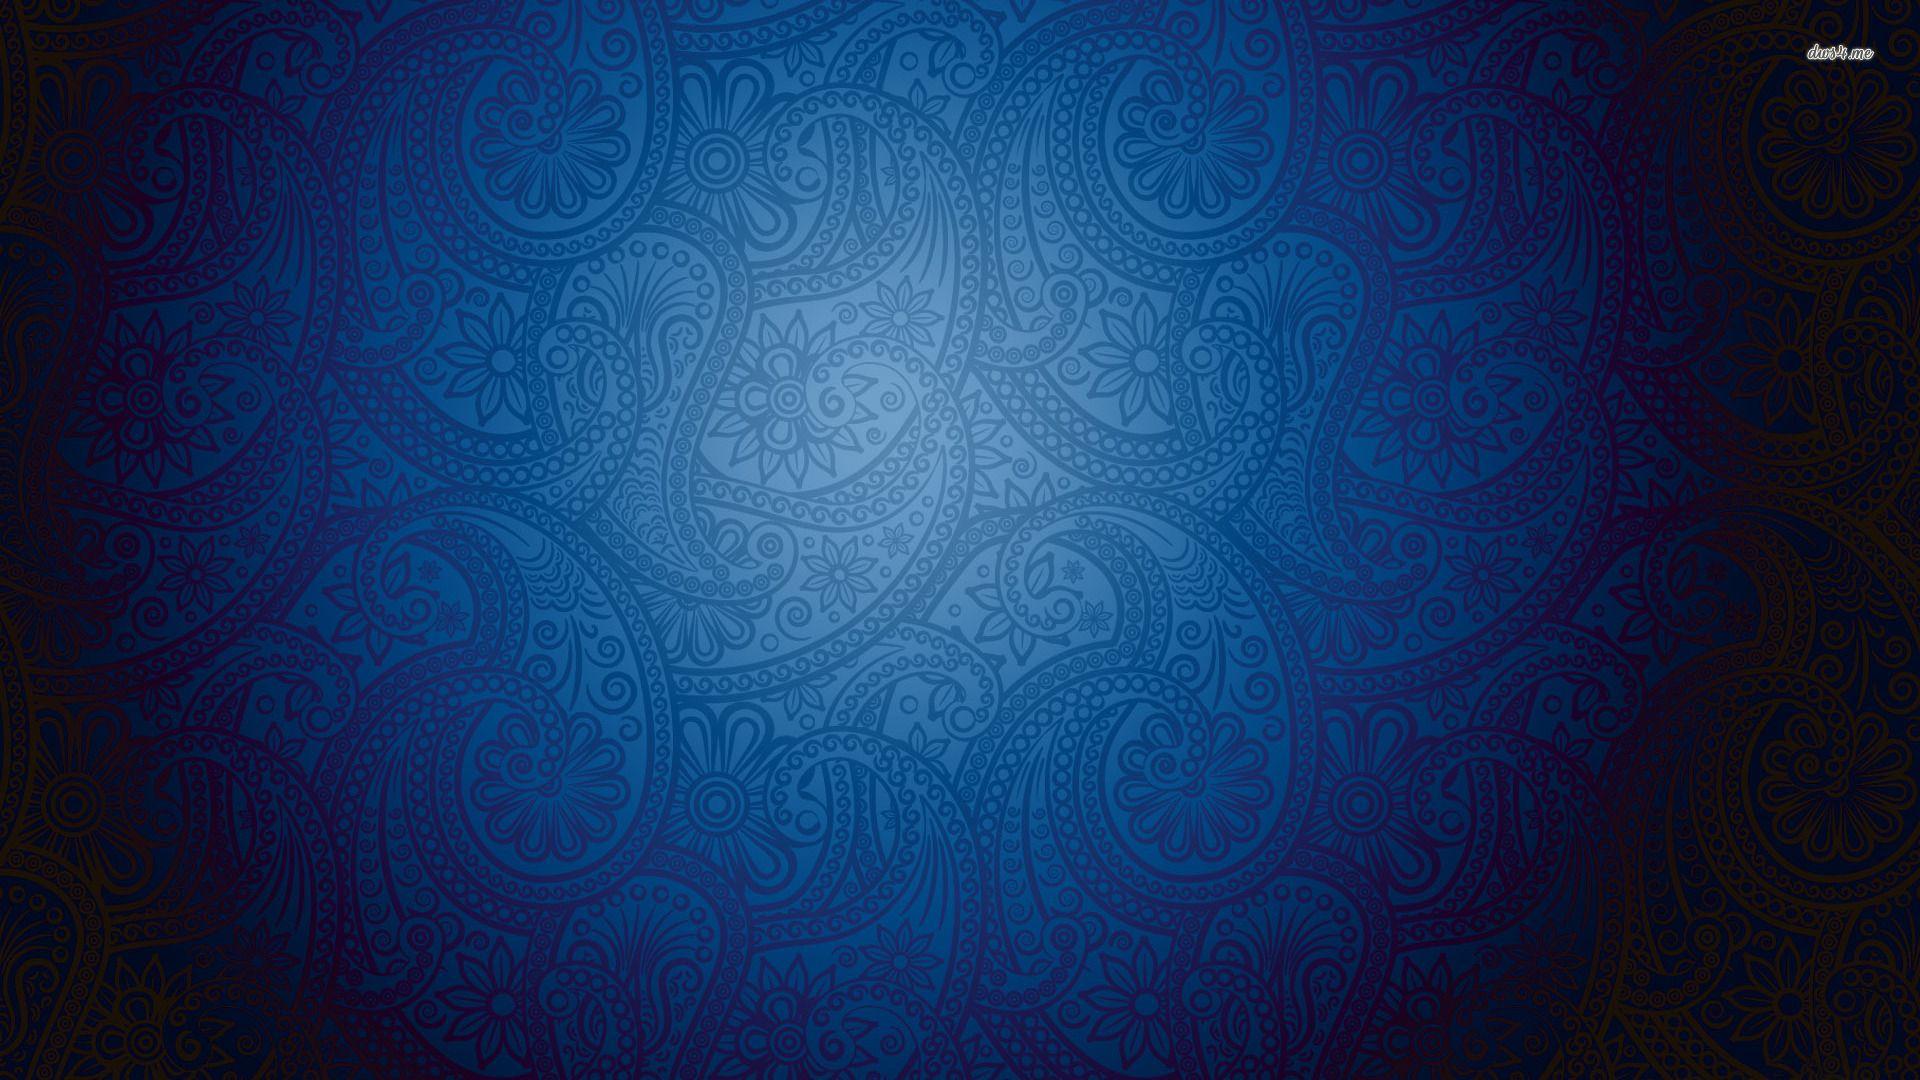 Dark blue flower background images